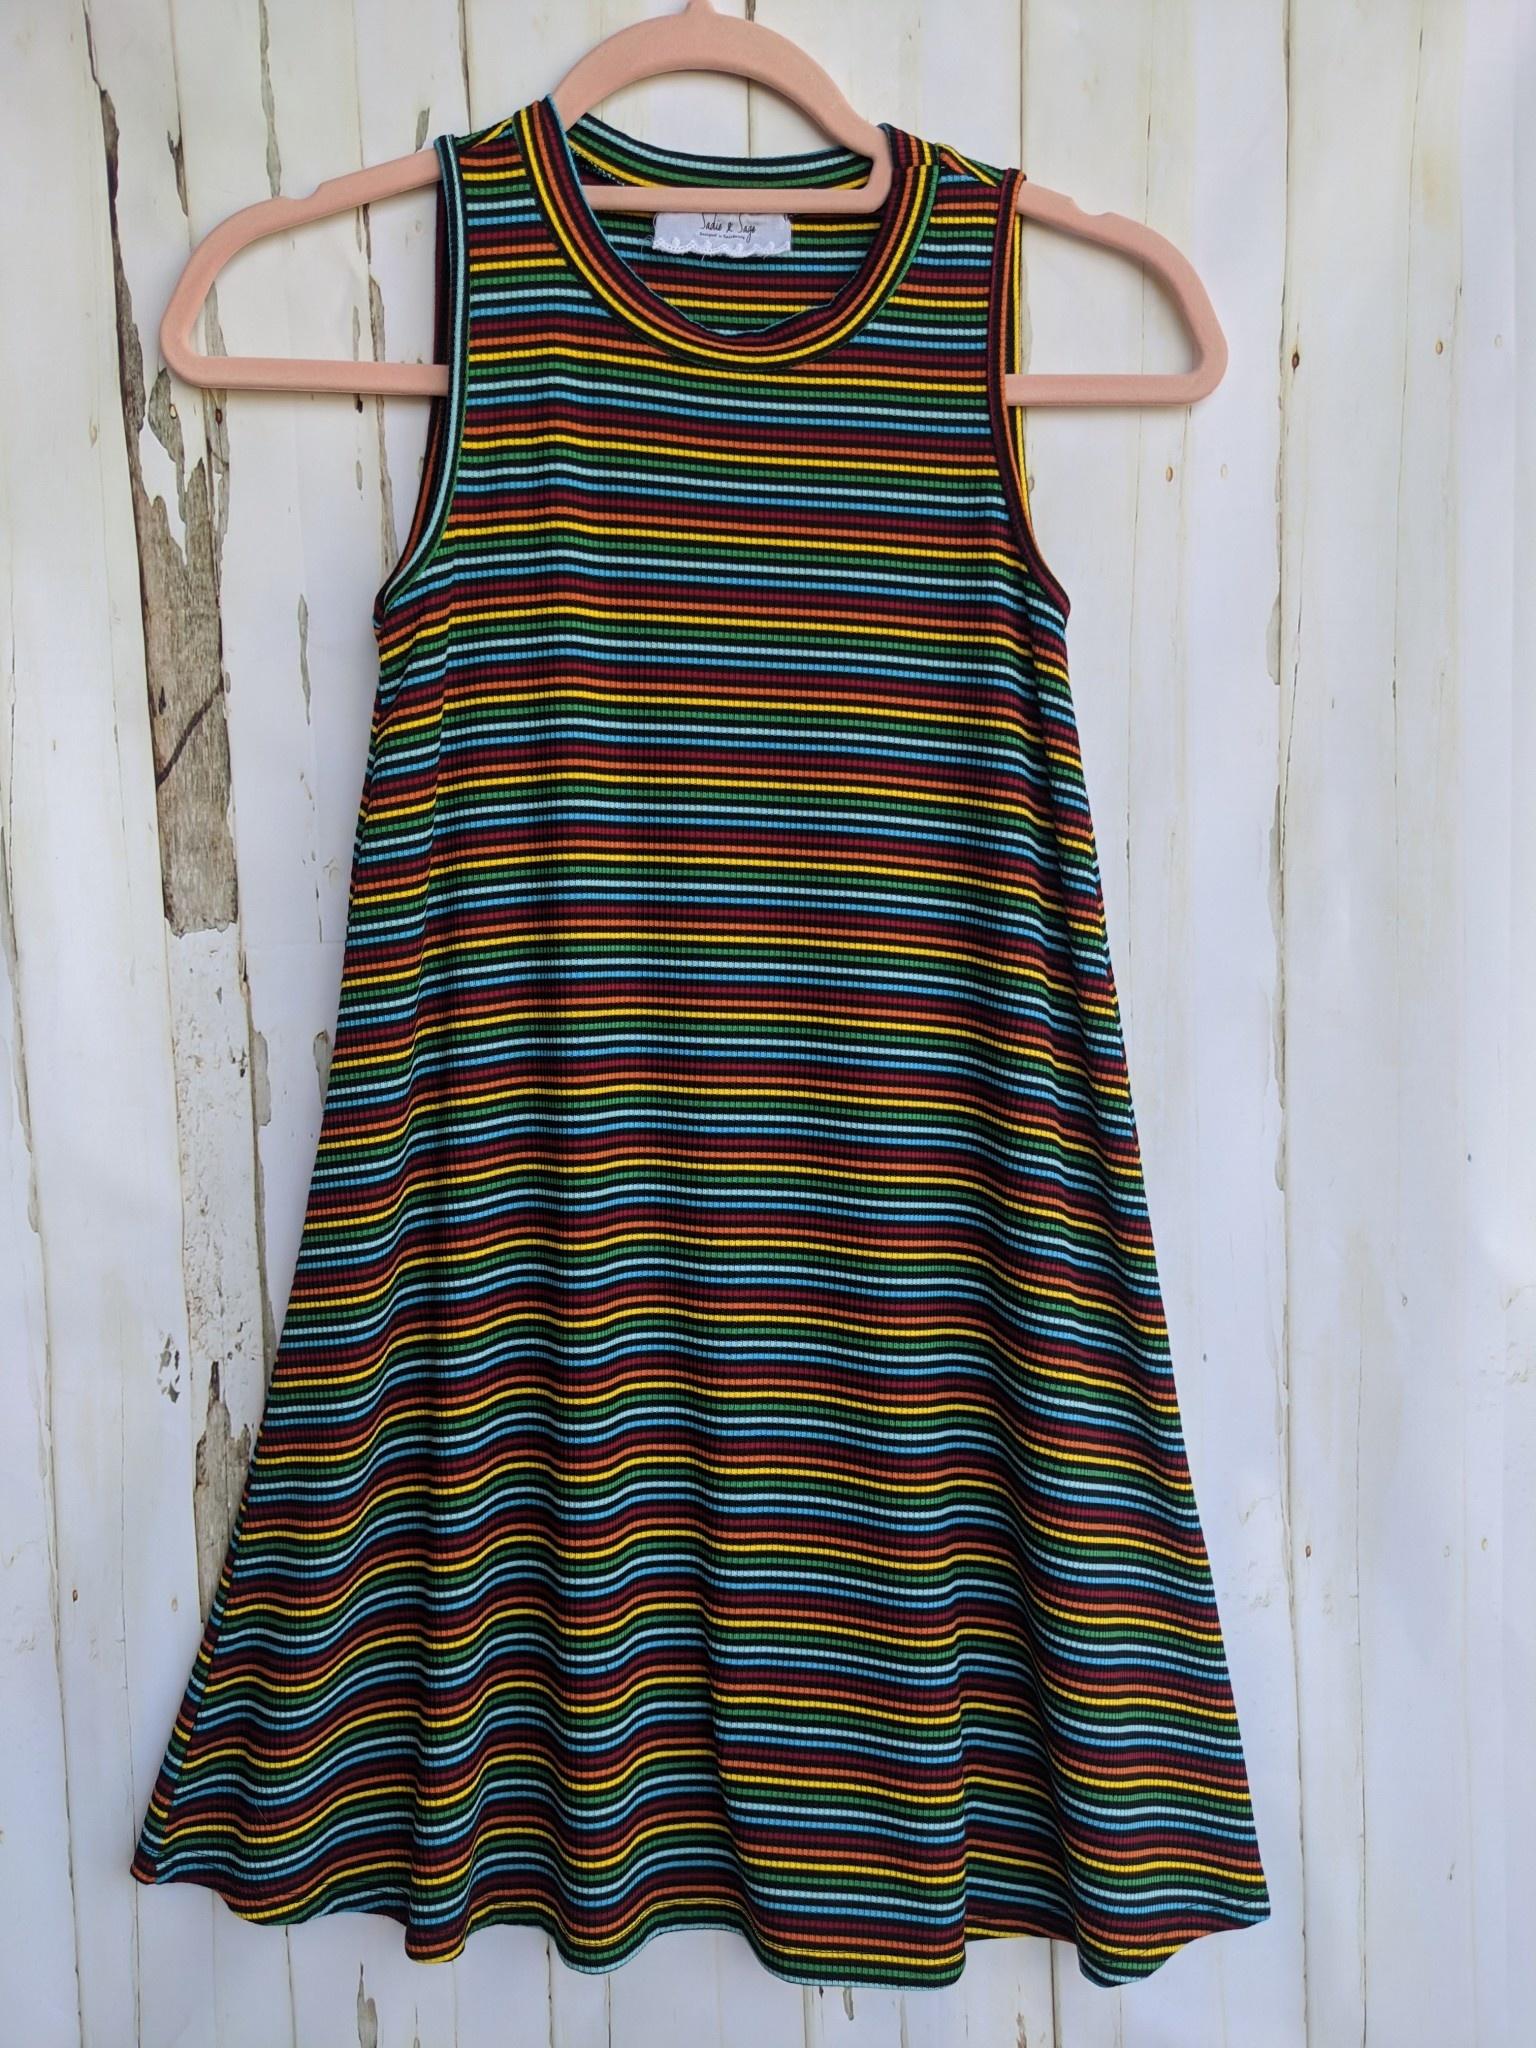 Sadie & Sage Tween Striped Swing Dress